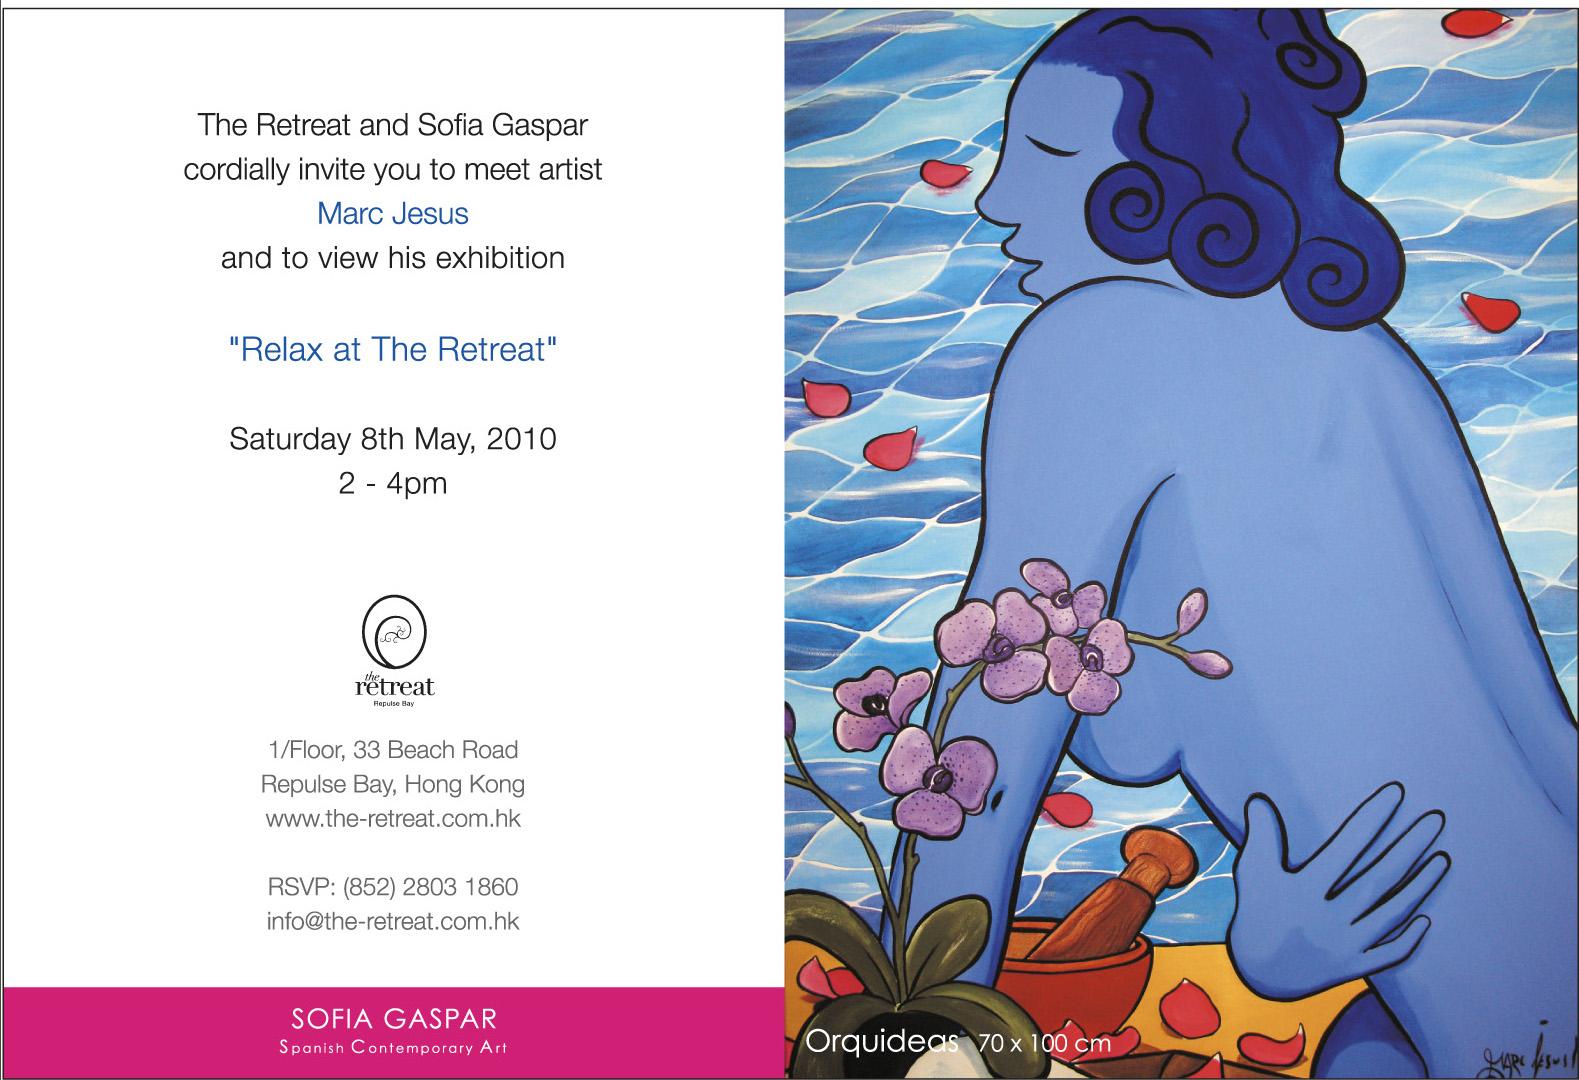 SOFIA GASPAR Spanish Contemporary Art Marc Jesus Exhibition May